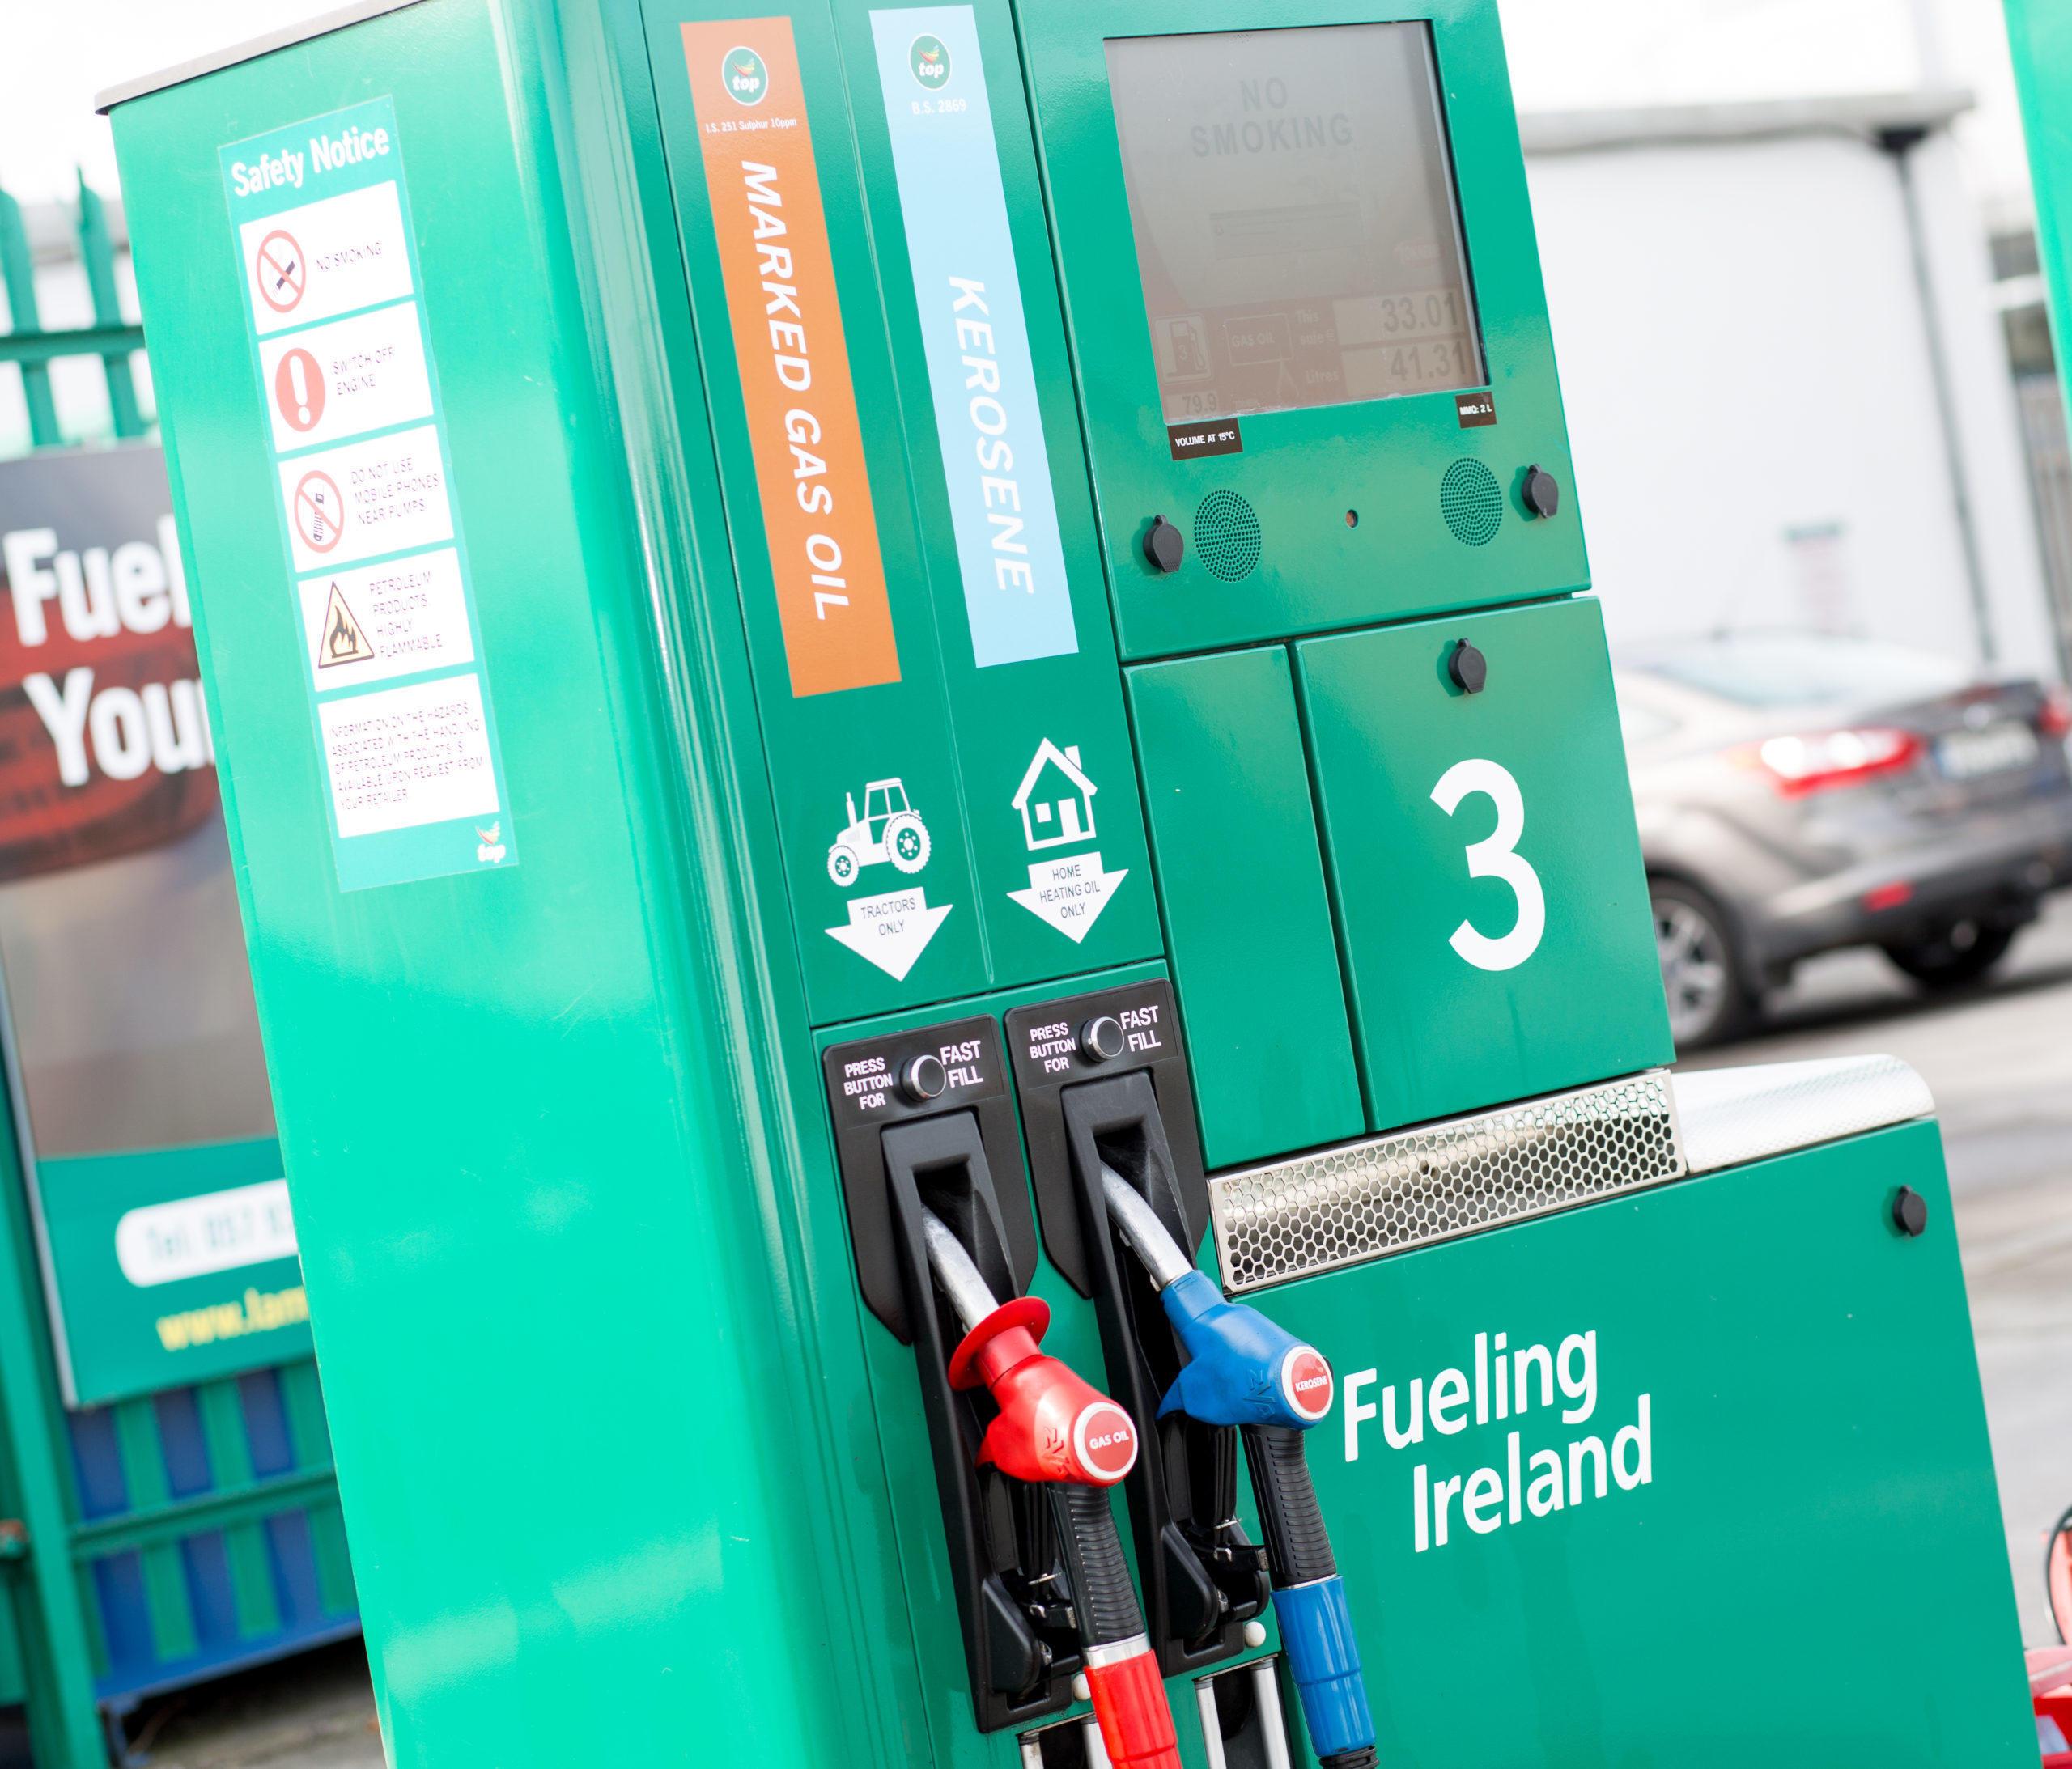 A petrol pump located at Lambes Oil petrol station Tullamore